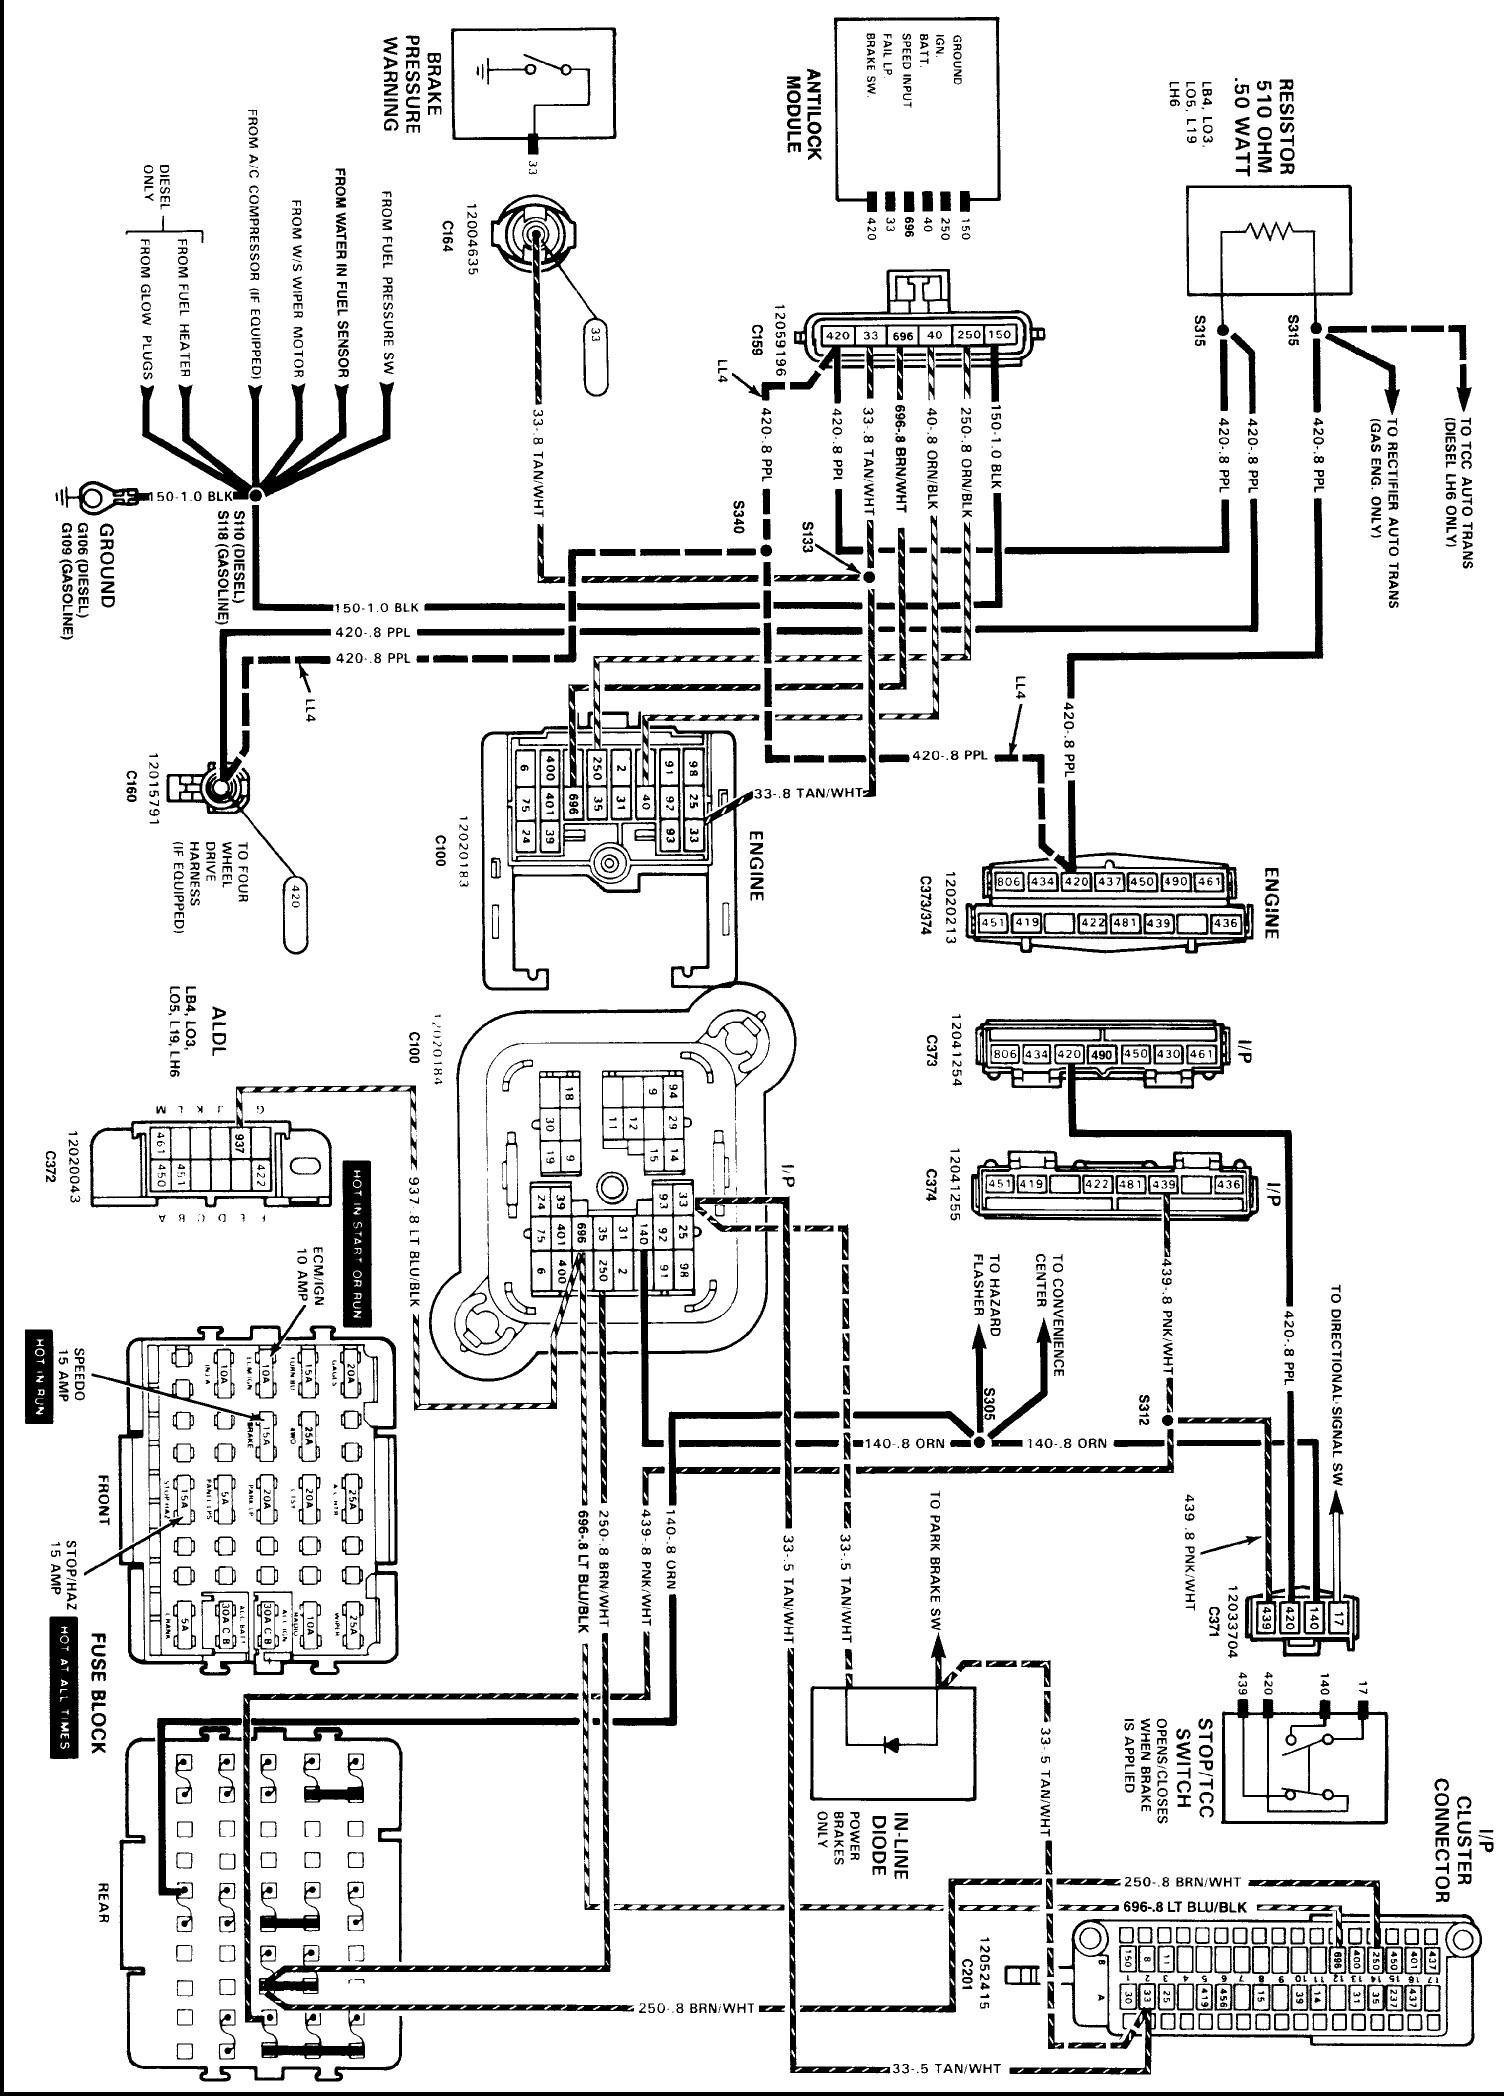 Chevy Truck Tail Light Wiring Diagram 89 Chevy 4—4 Wiring Diagram Wiring Info •